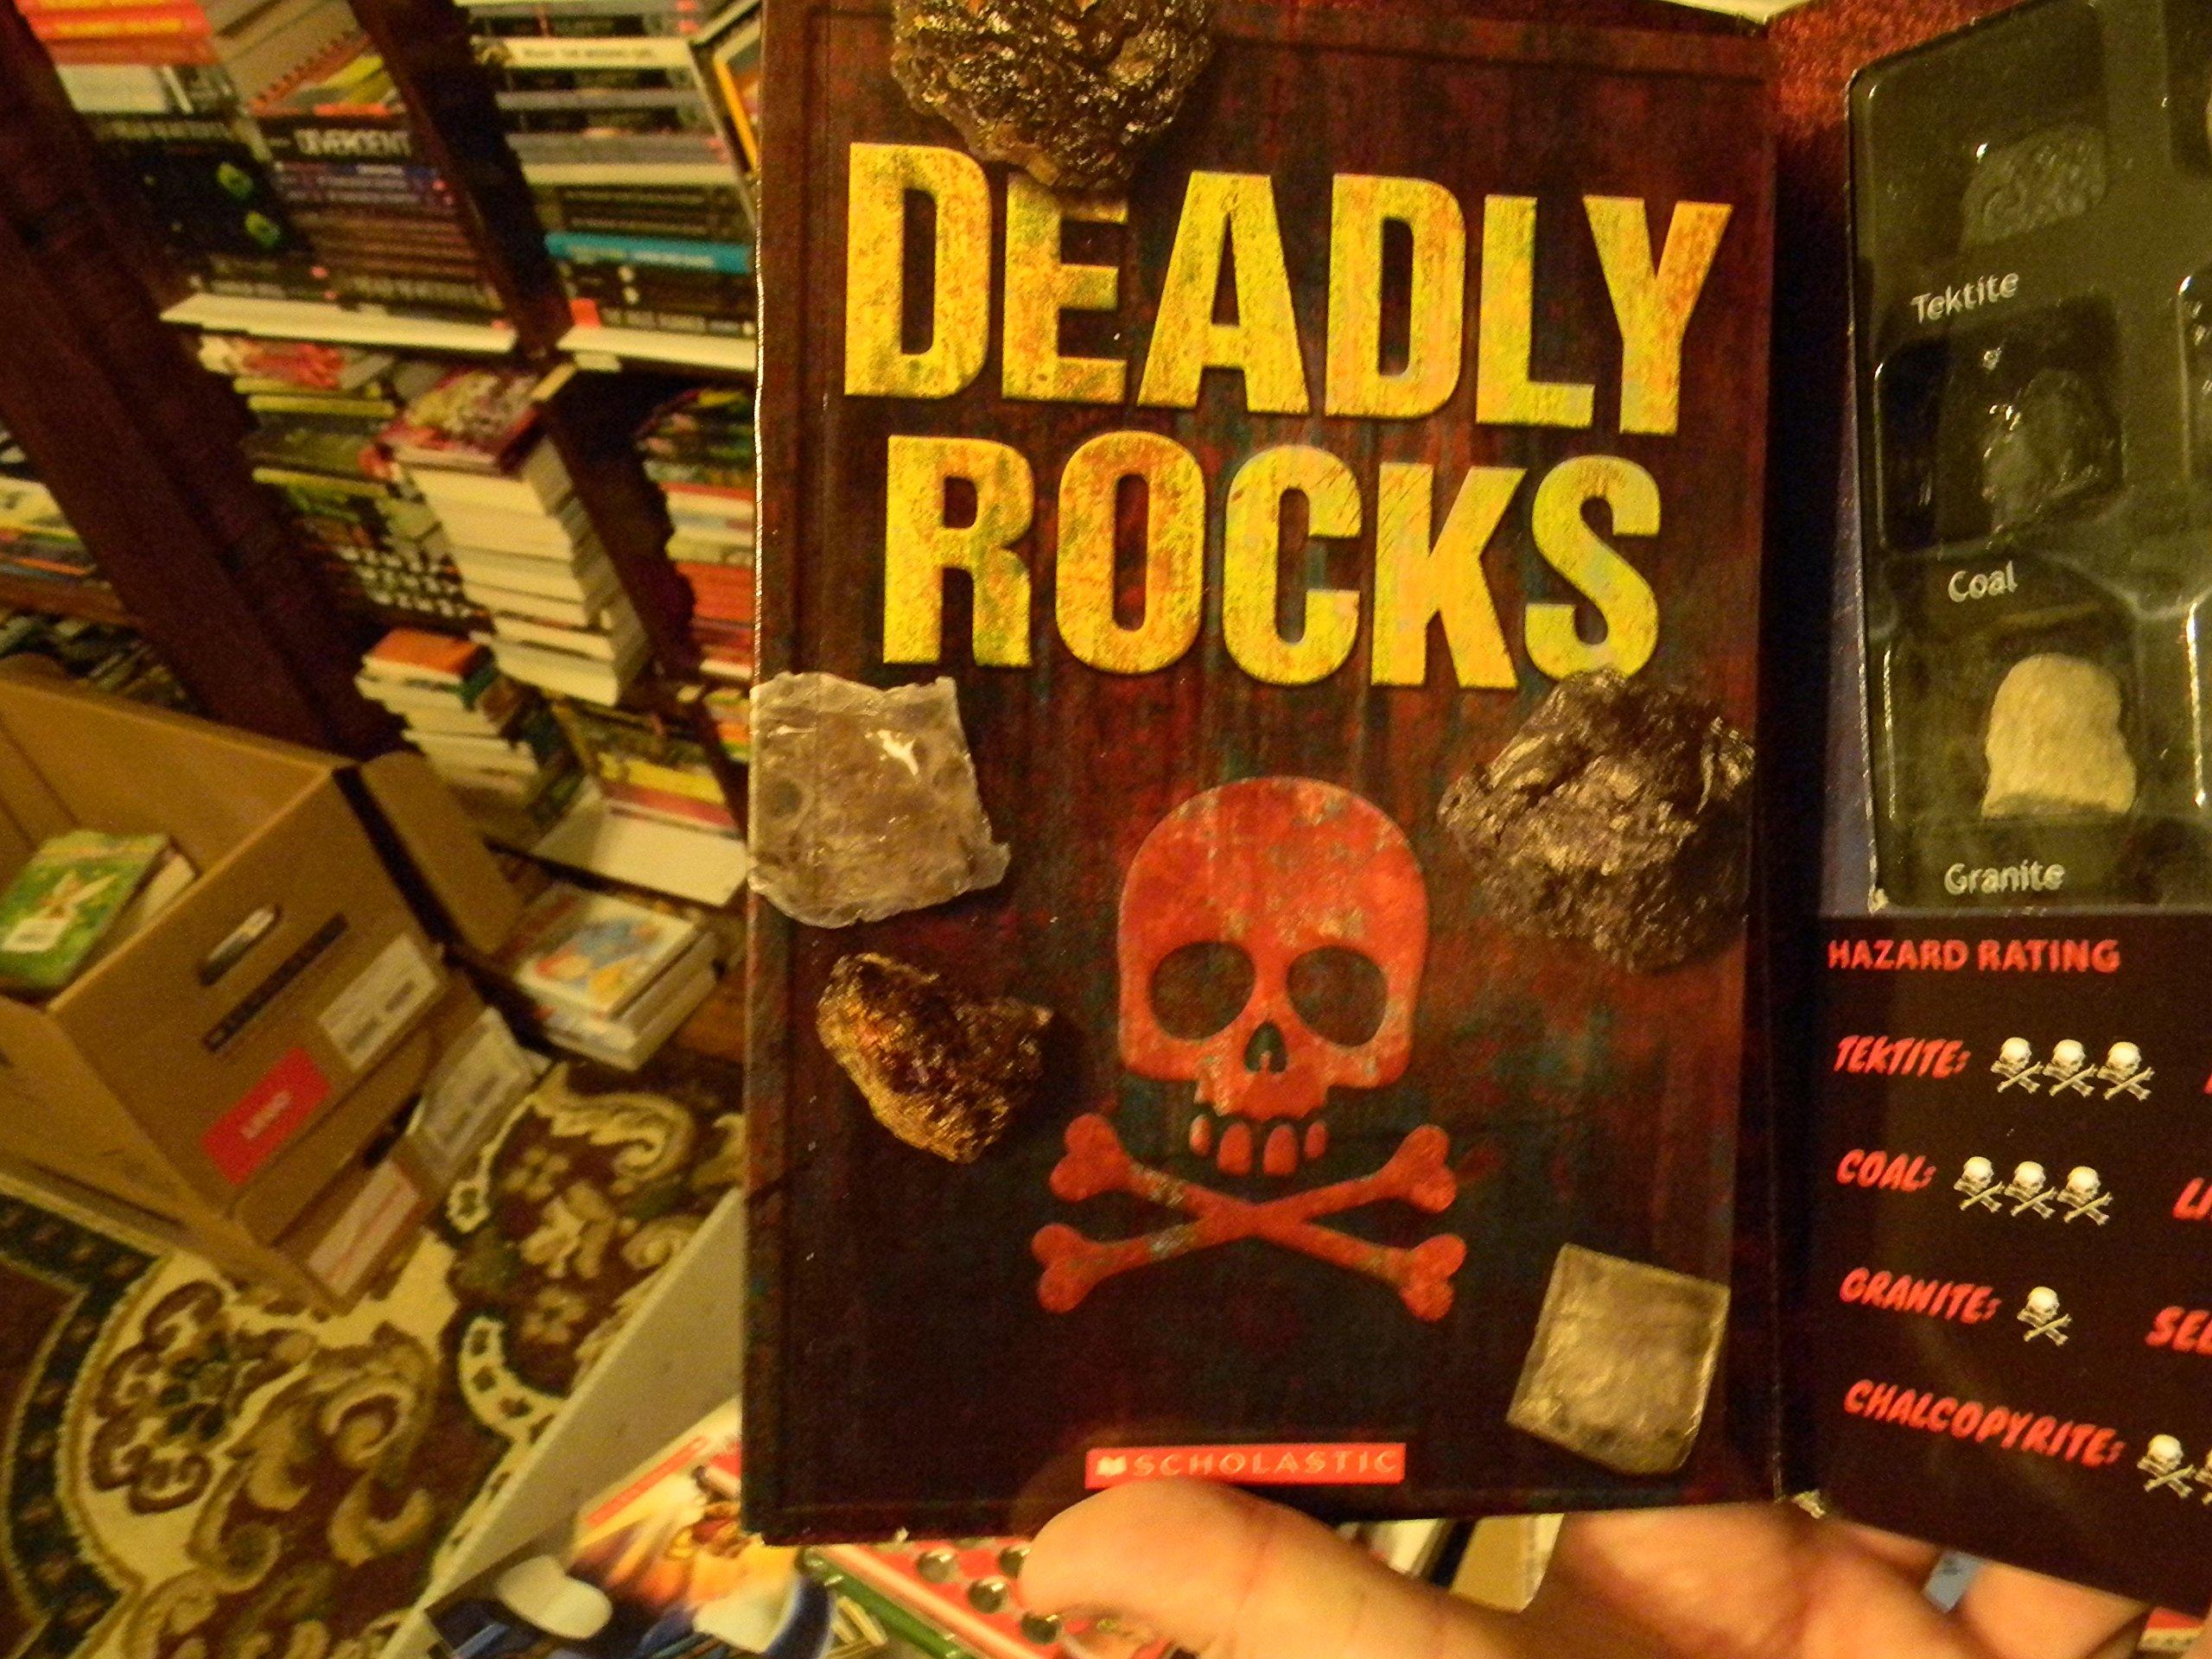 Download Deadly Rocks [Paperback Booklet +9 Rock Specimens] (Boxed Kit) By Kris Hirshmann PDF